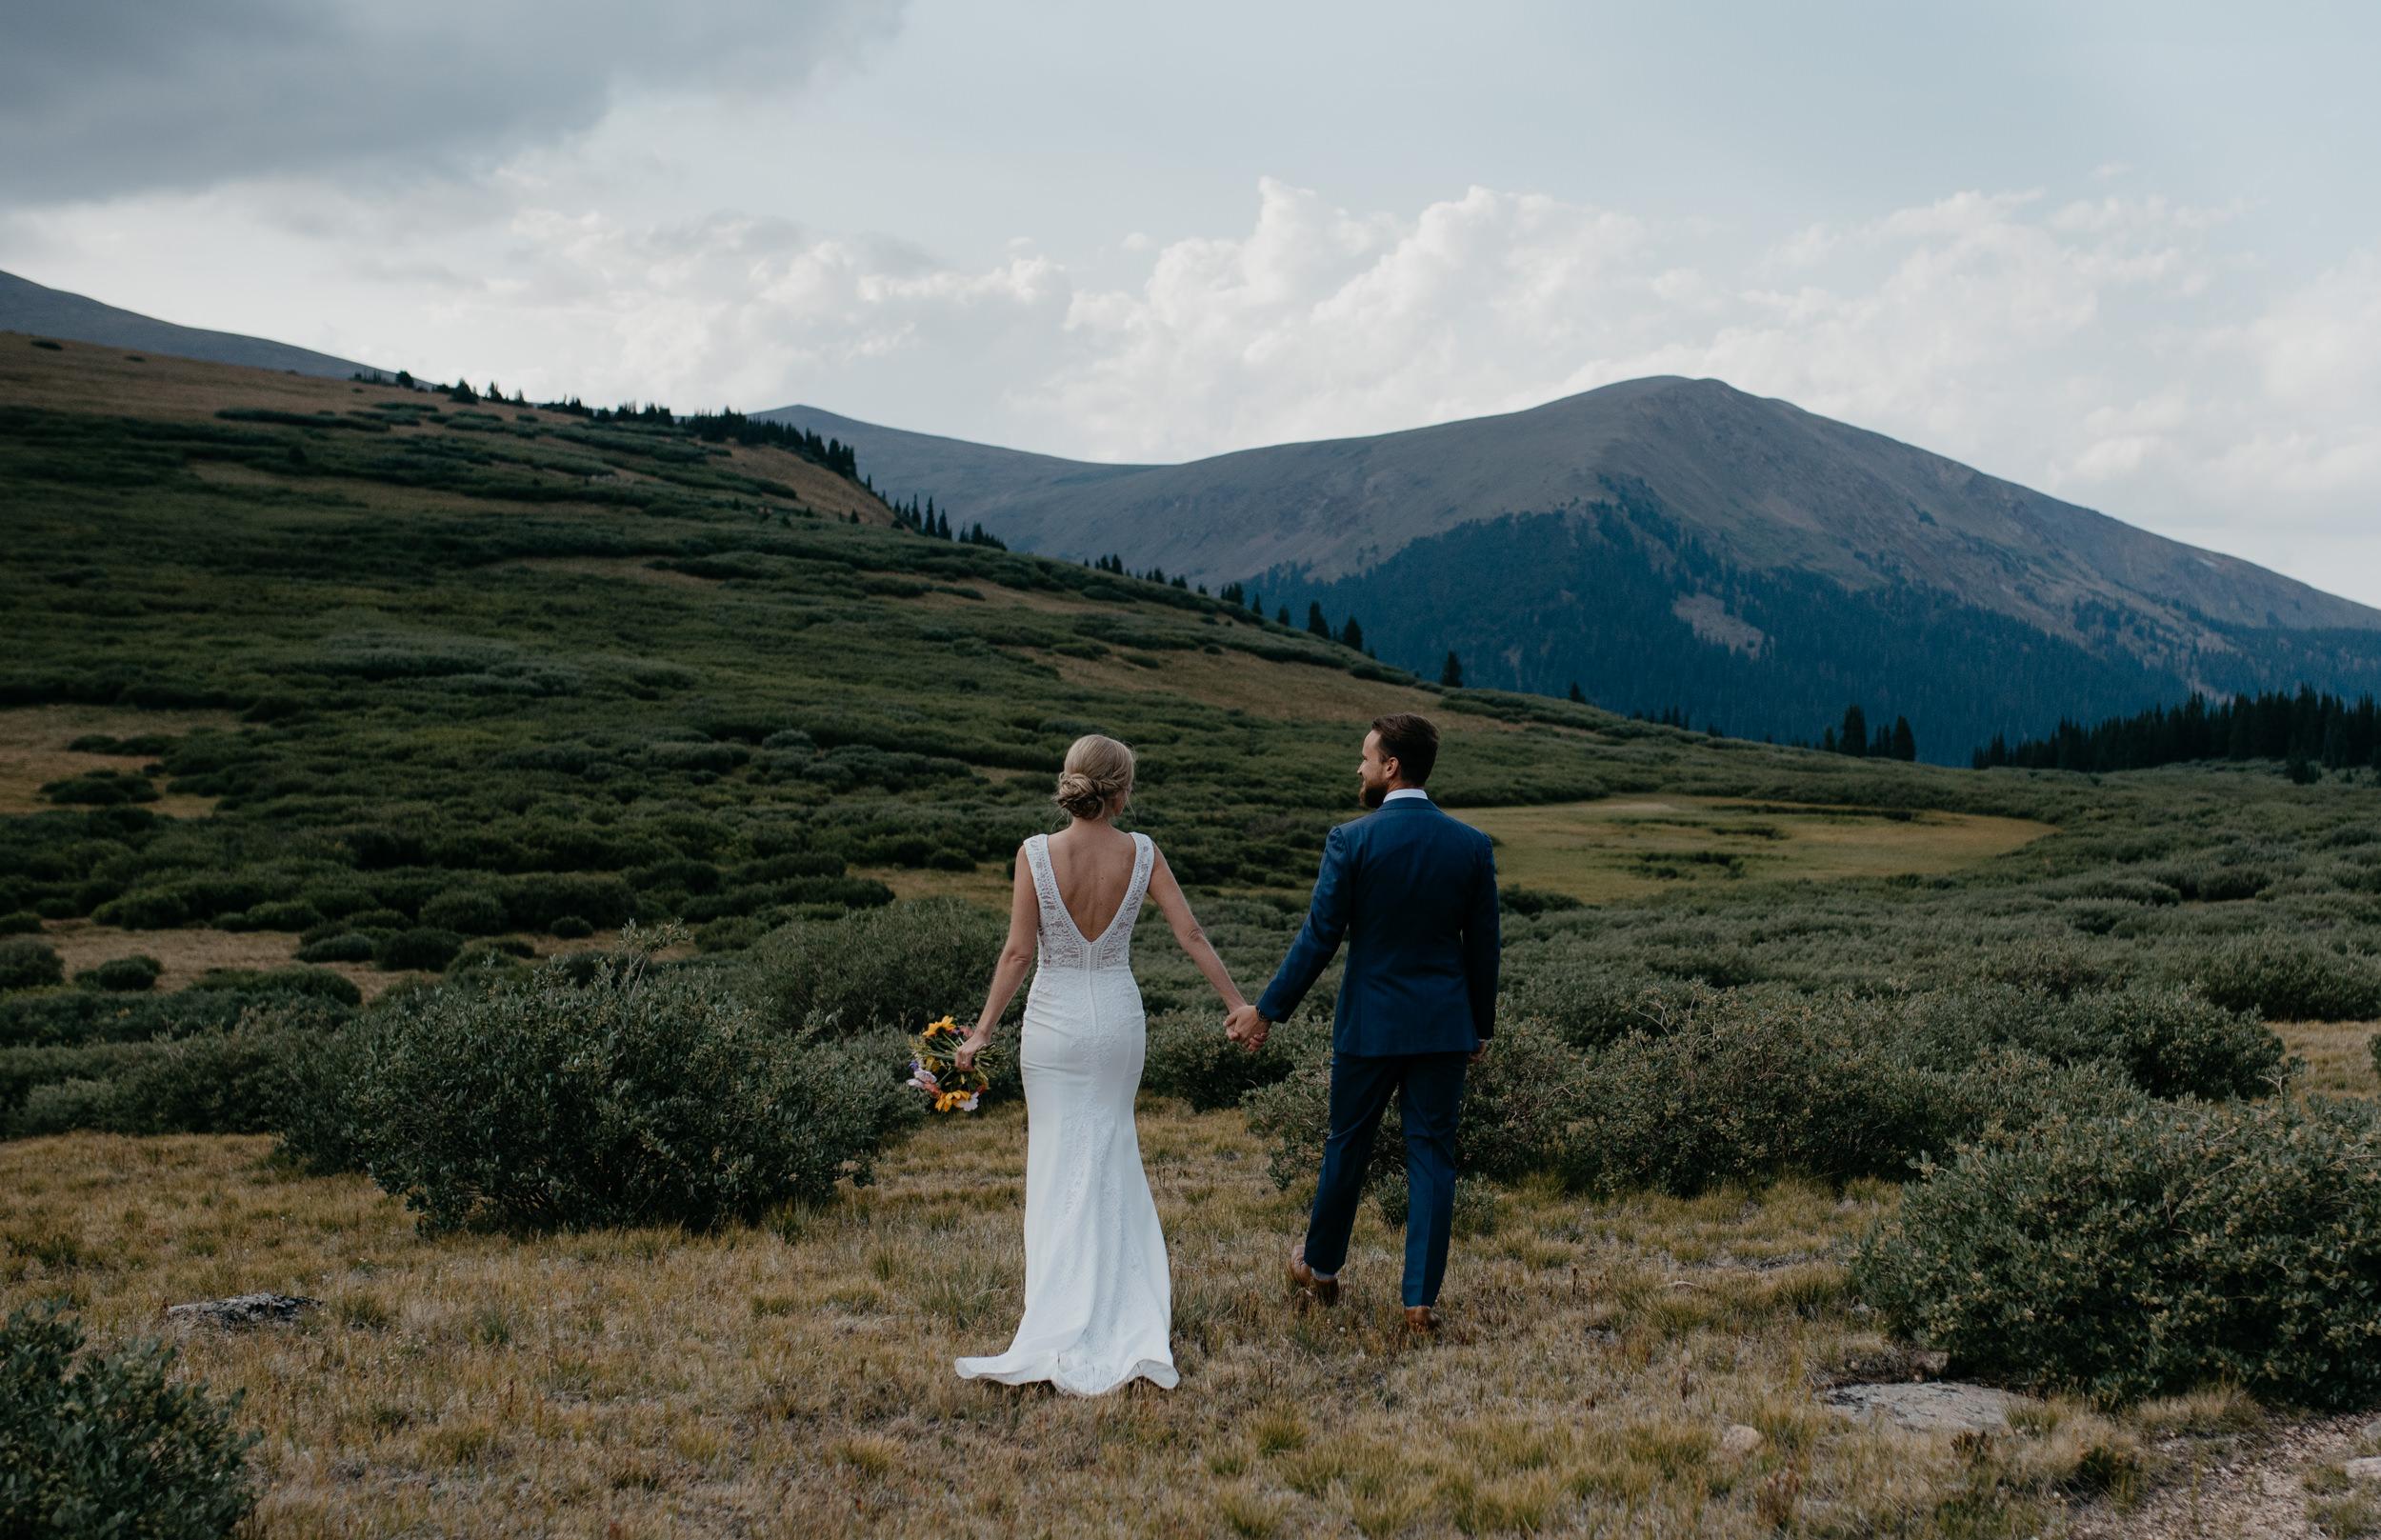 Hiking elopement in Colorado. Denver wedding photographer.